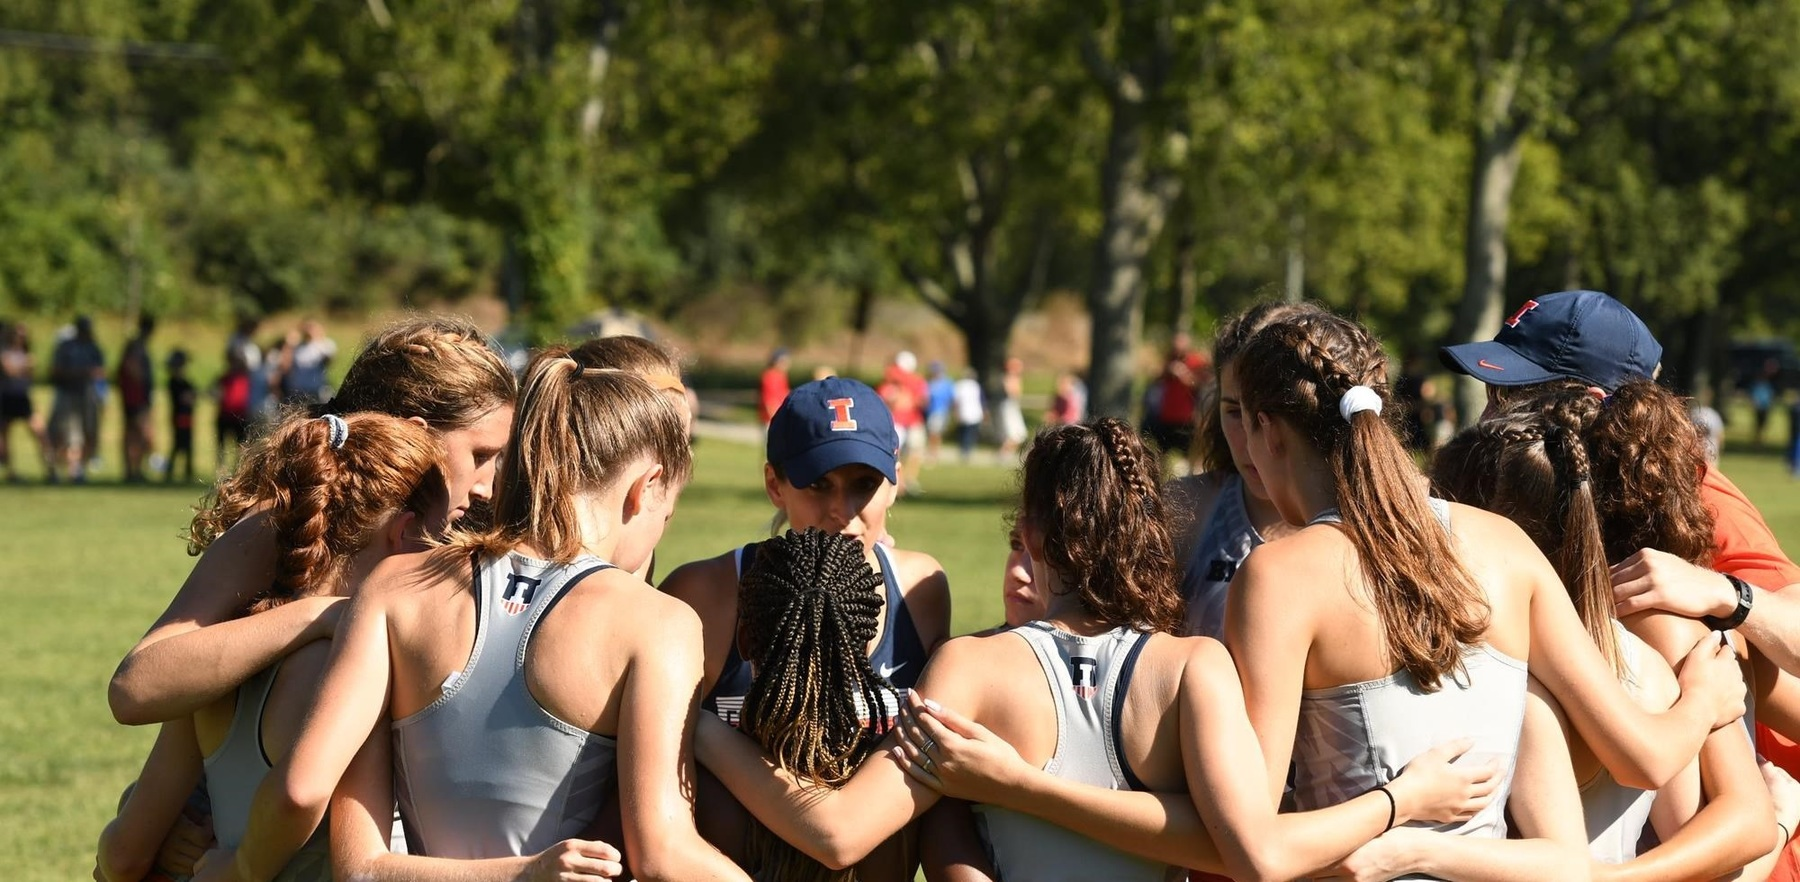 women's team members huddle